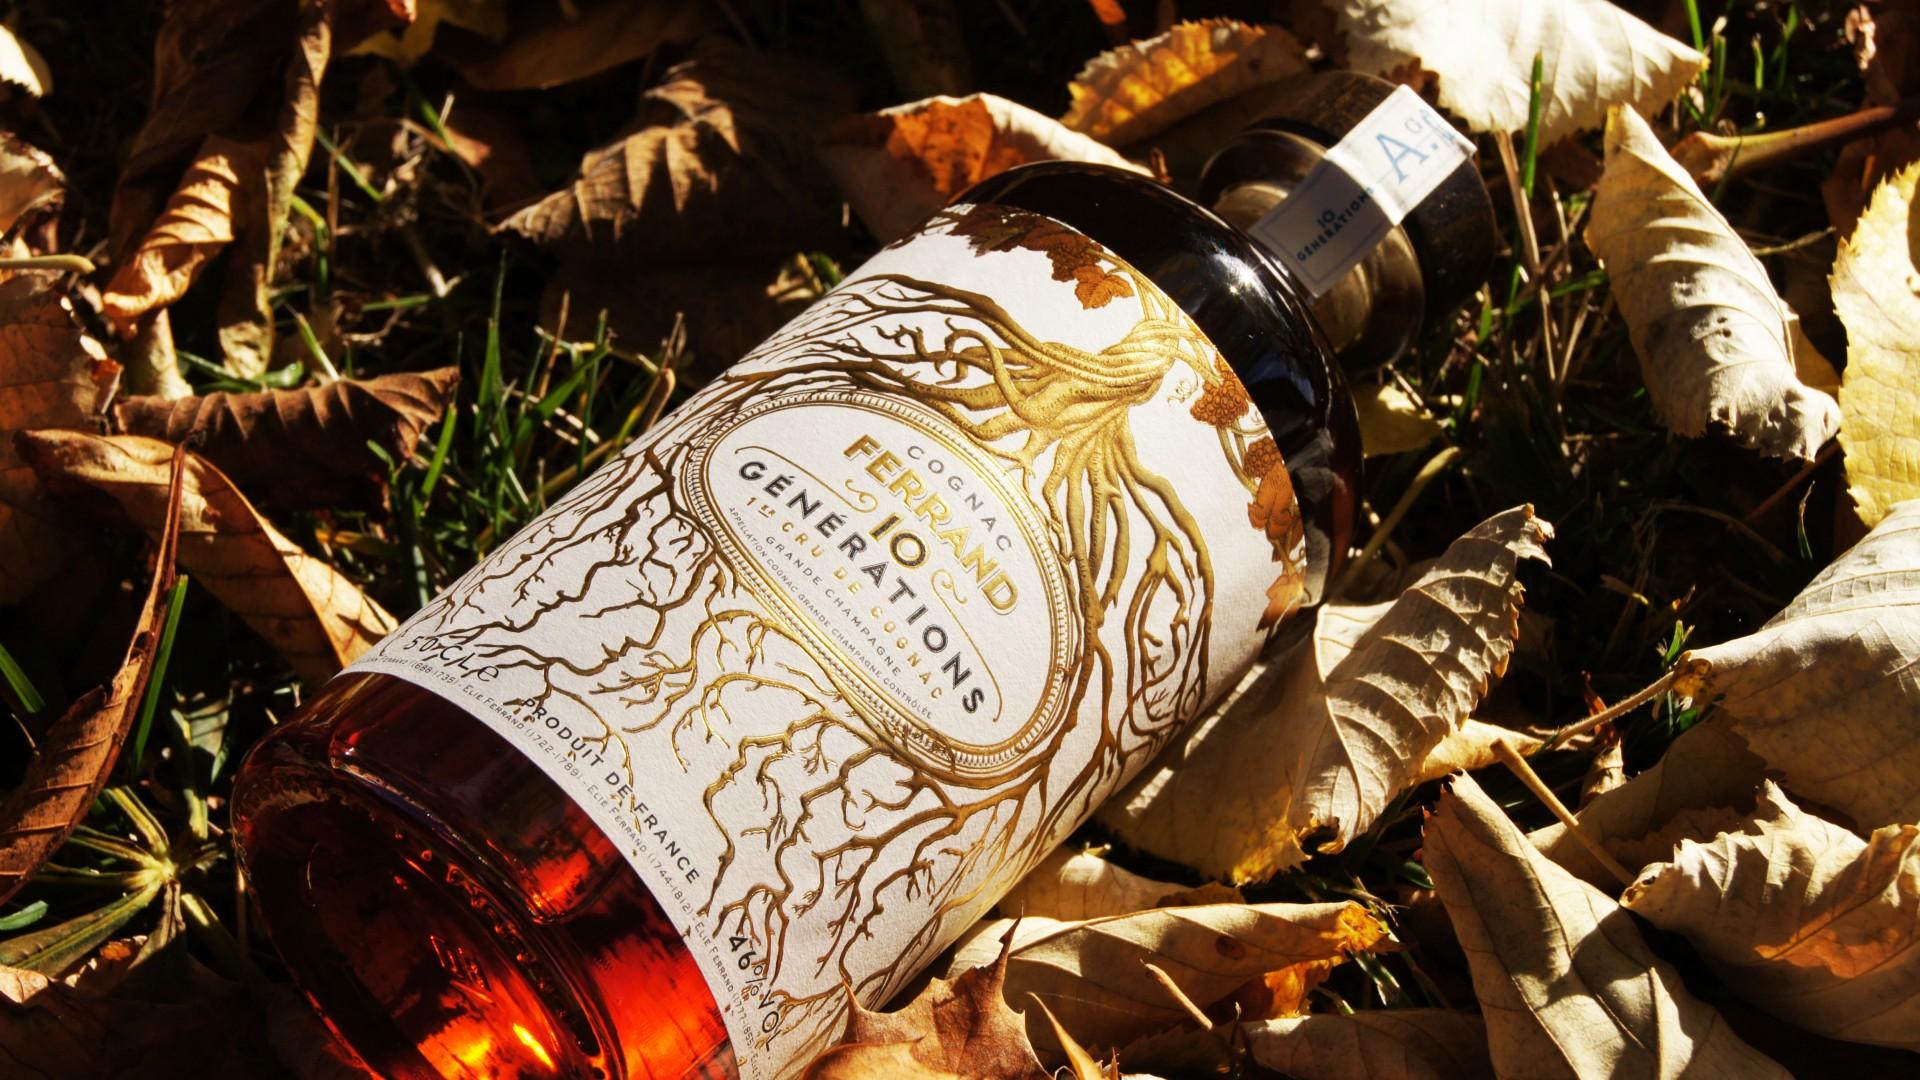 Pierre Ferrand '10 Generations' Cognac